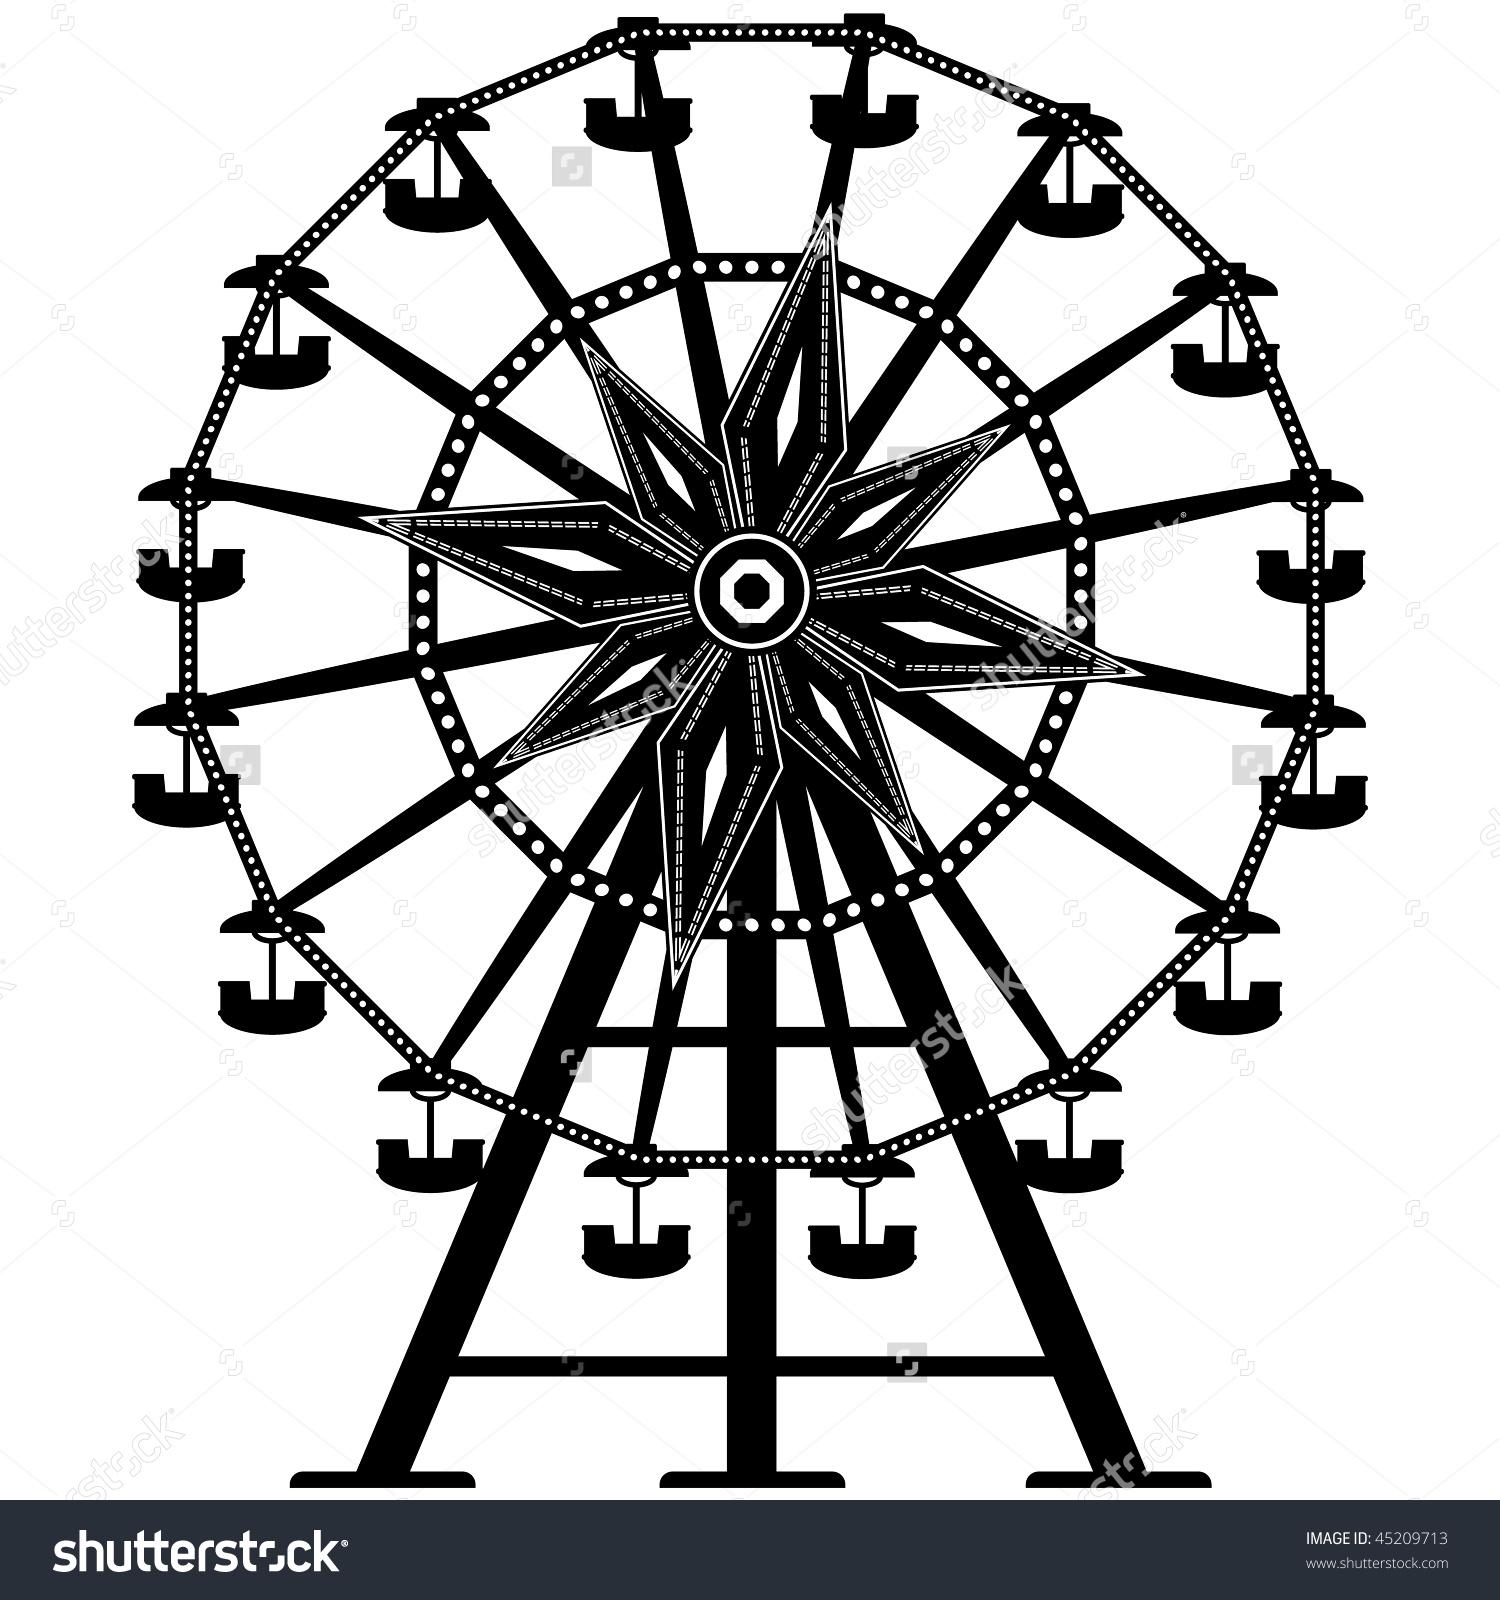 Vintage ferris wheel clipart.